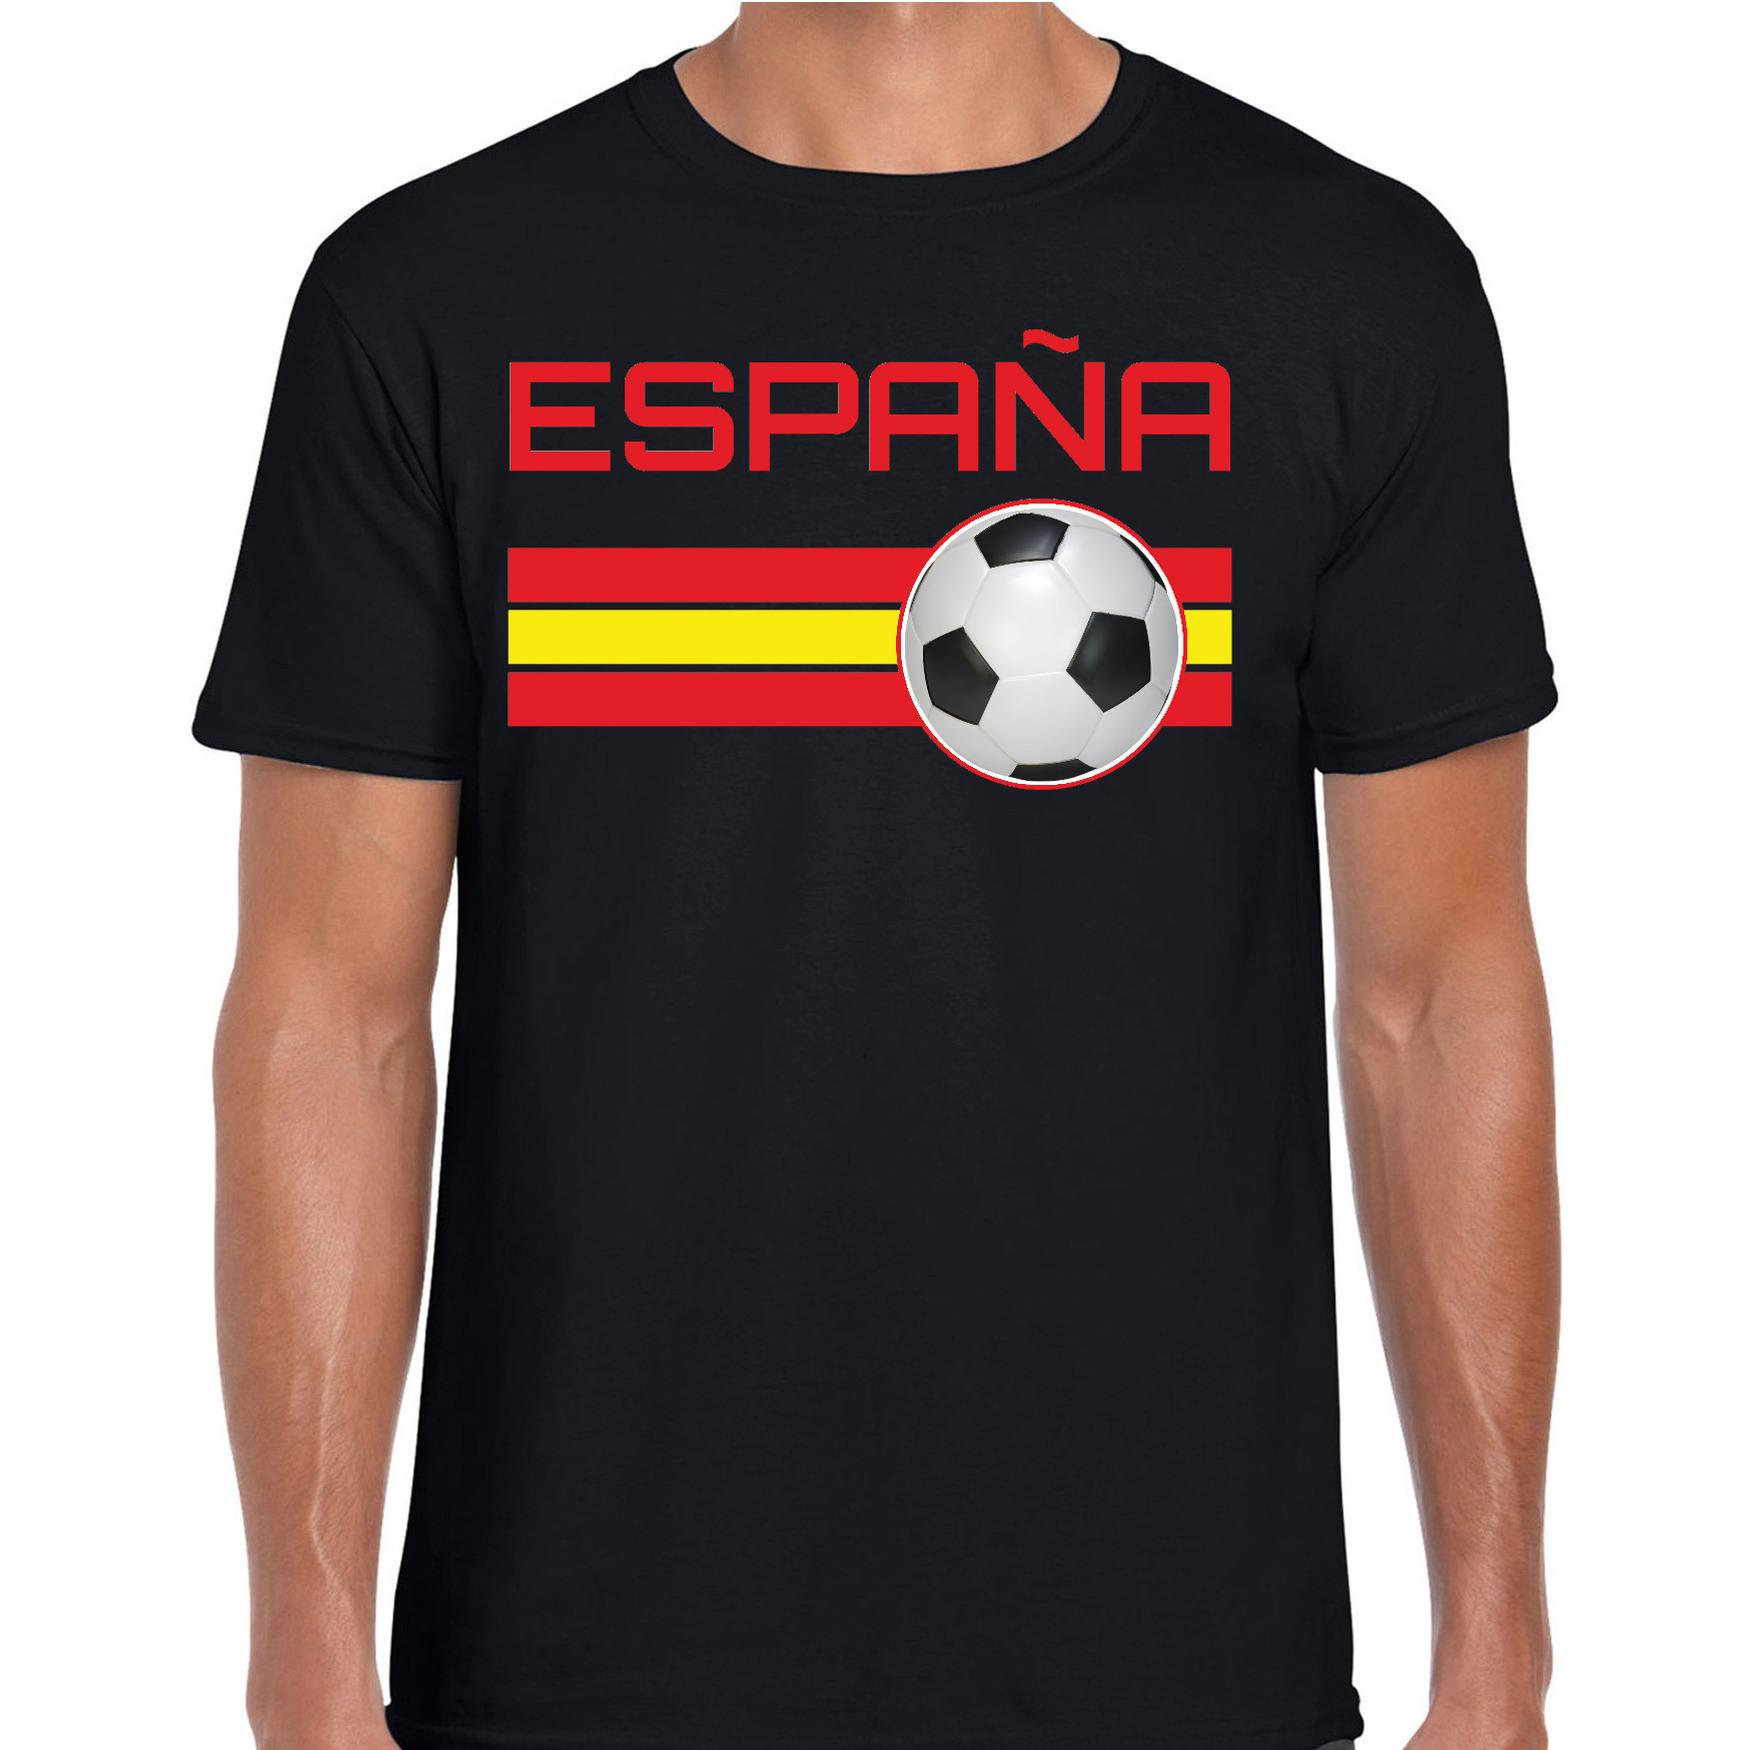 Espana / Spanje voetbal / landen t-shirt zwart heren